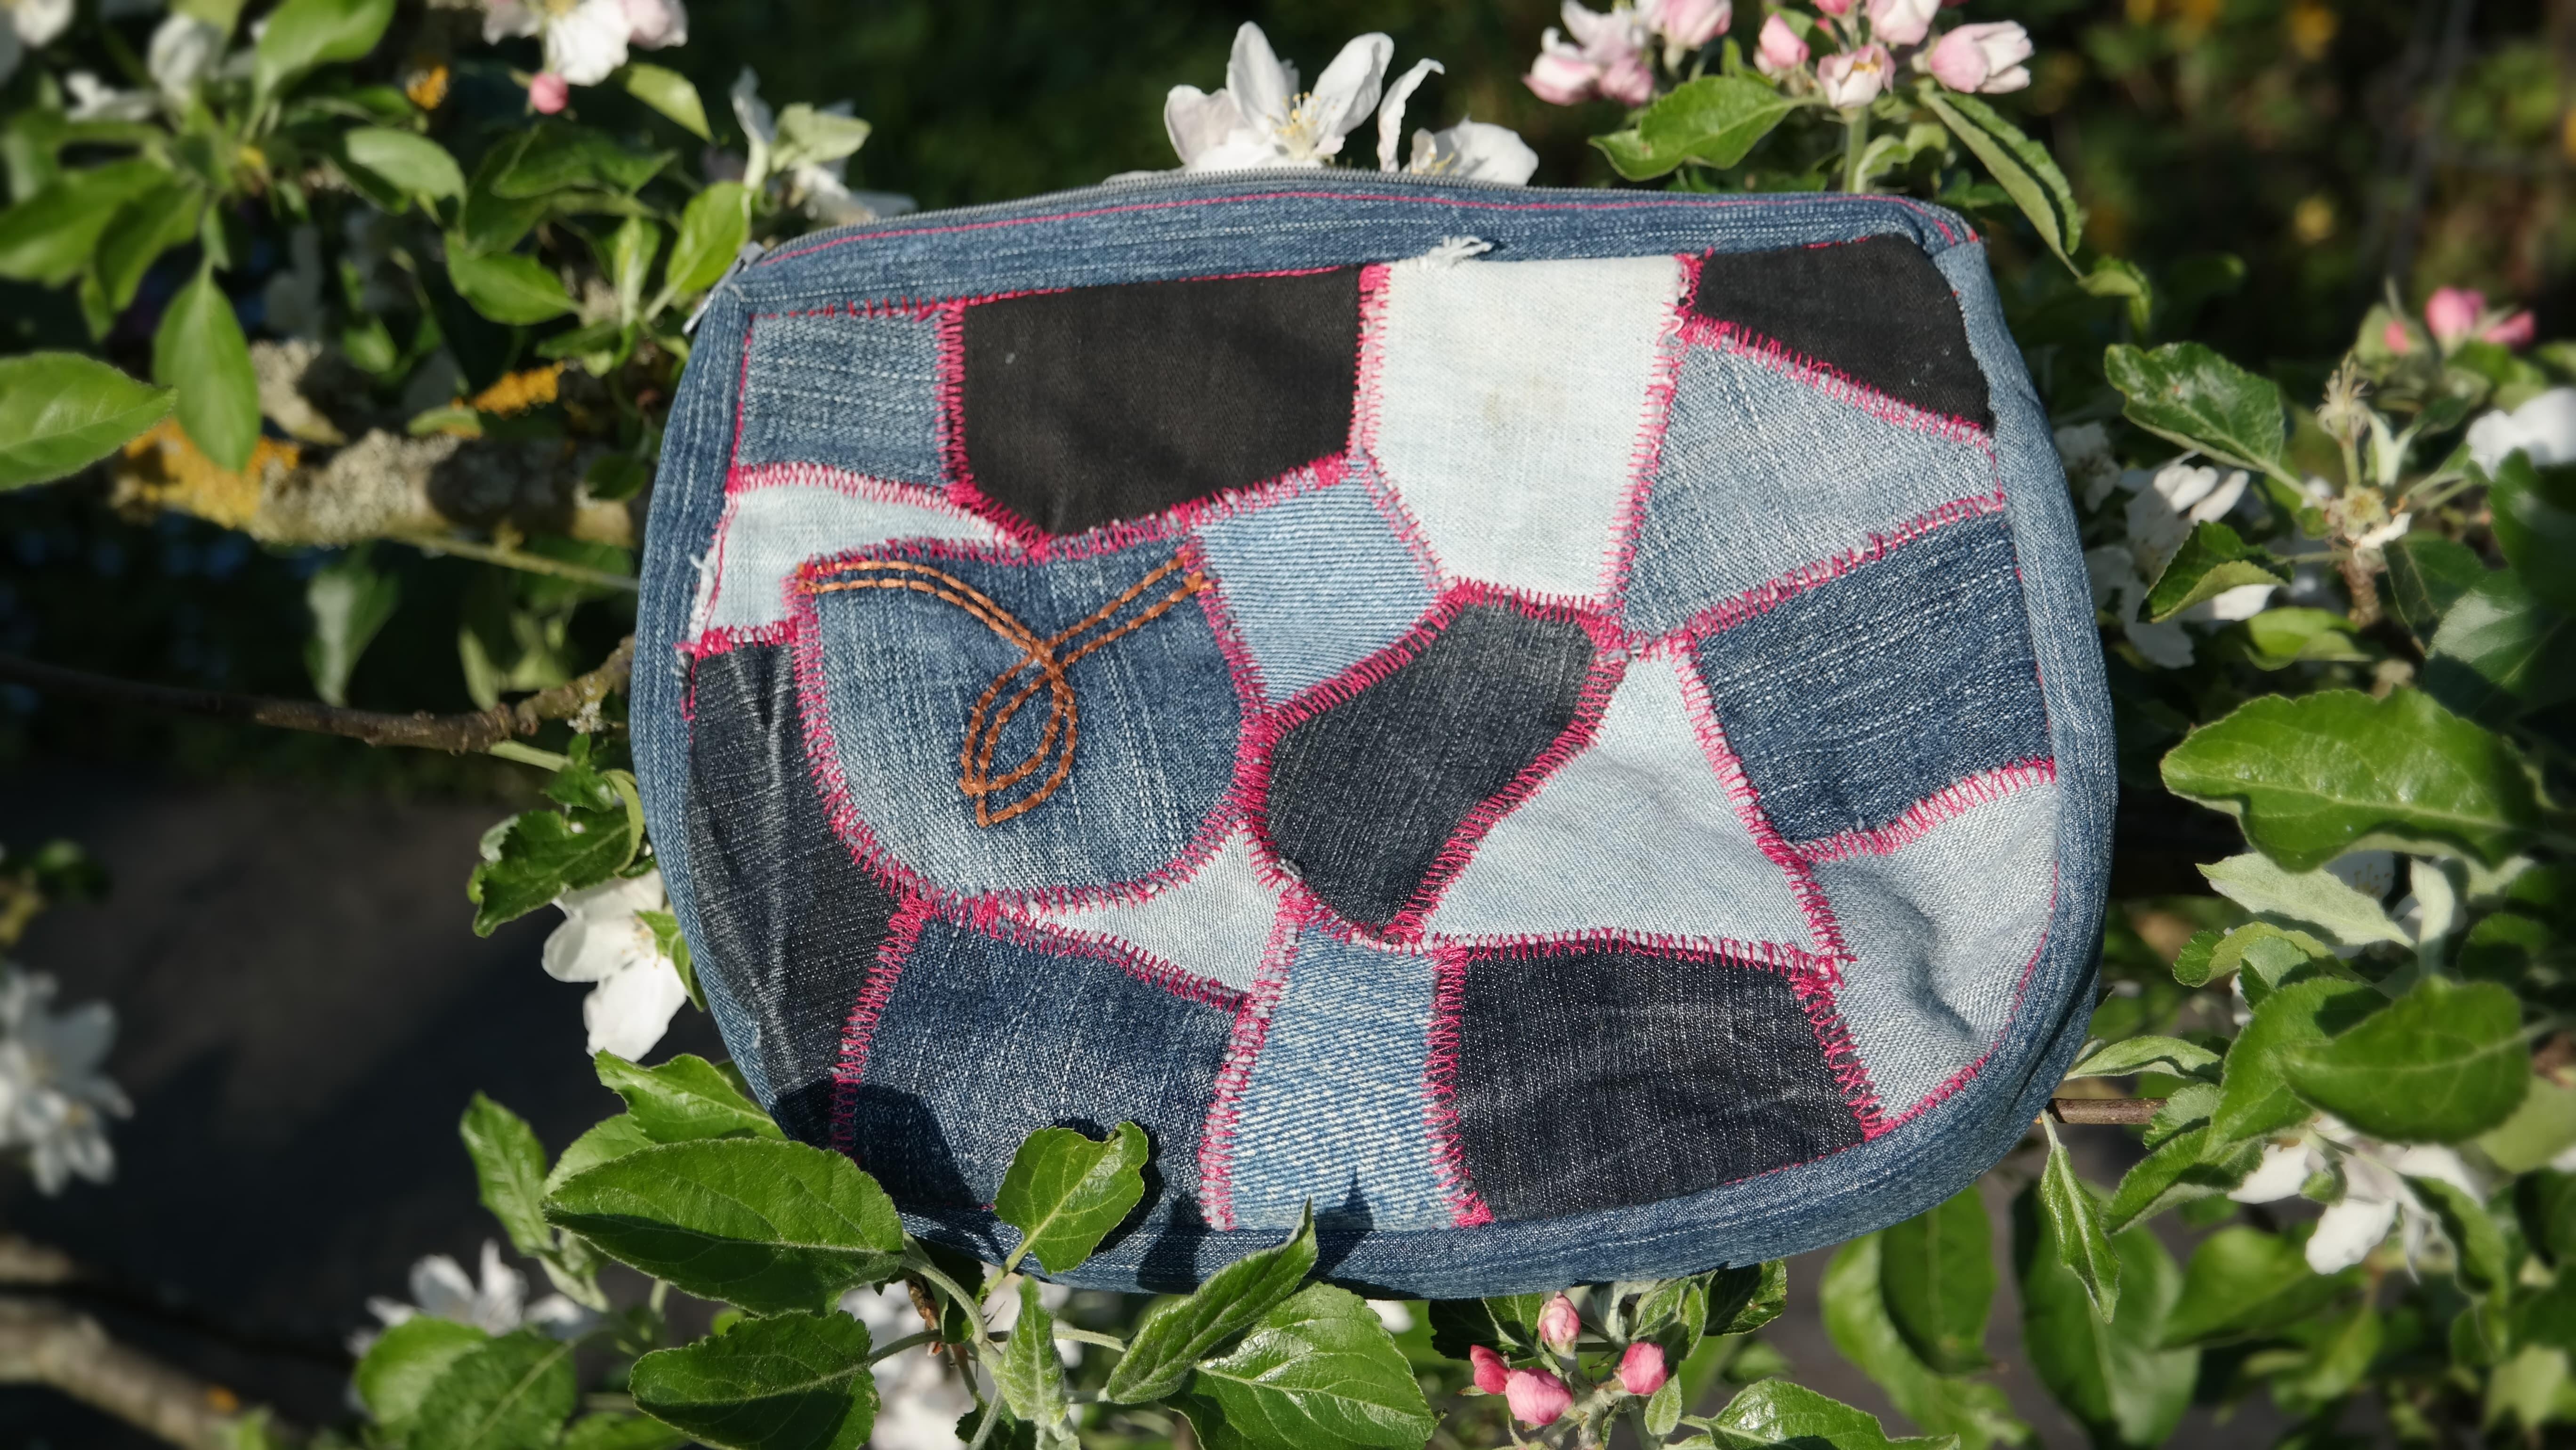 DIY nähen Jeans Kulturbeutel Patchwork groß von Vara-Kreativa